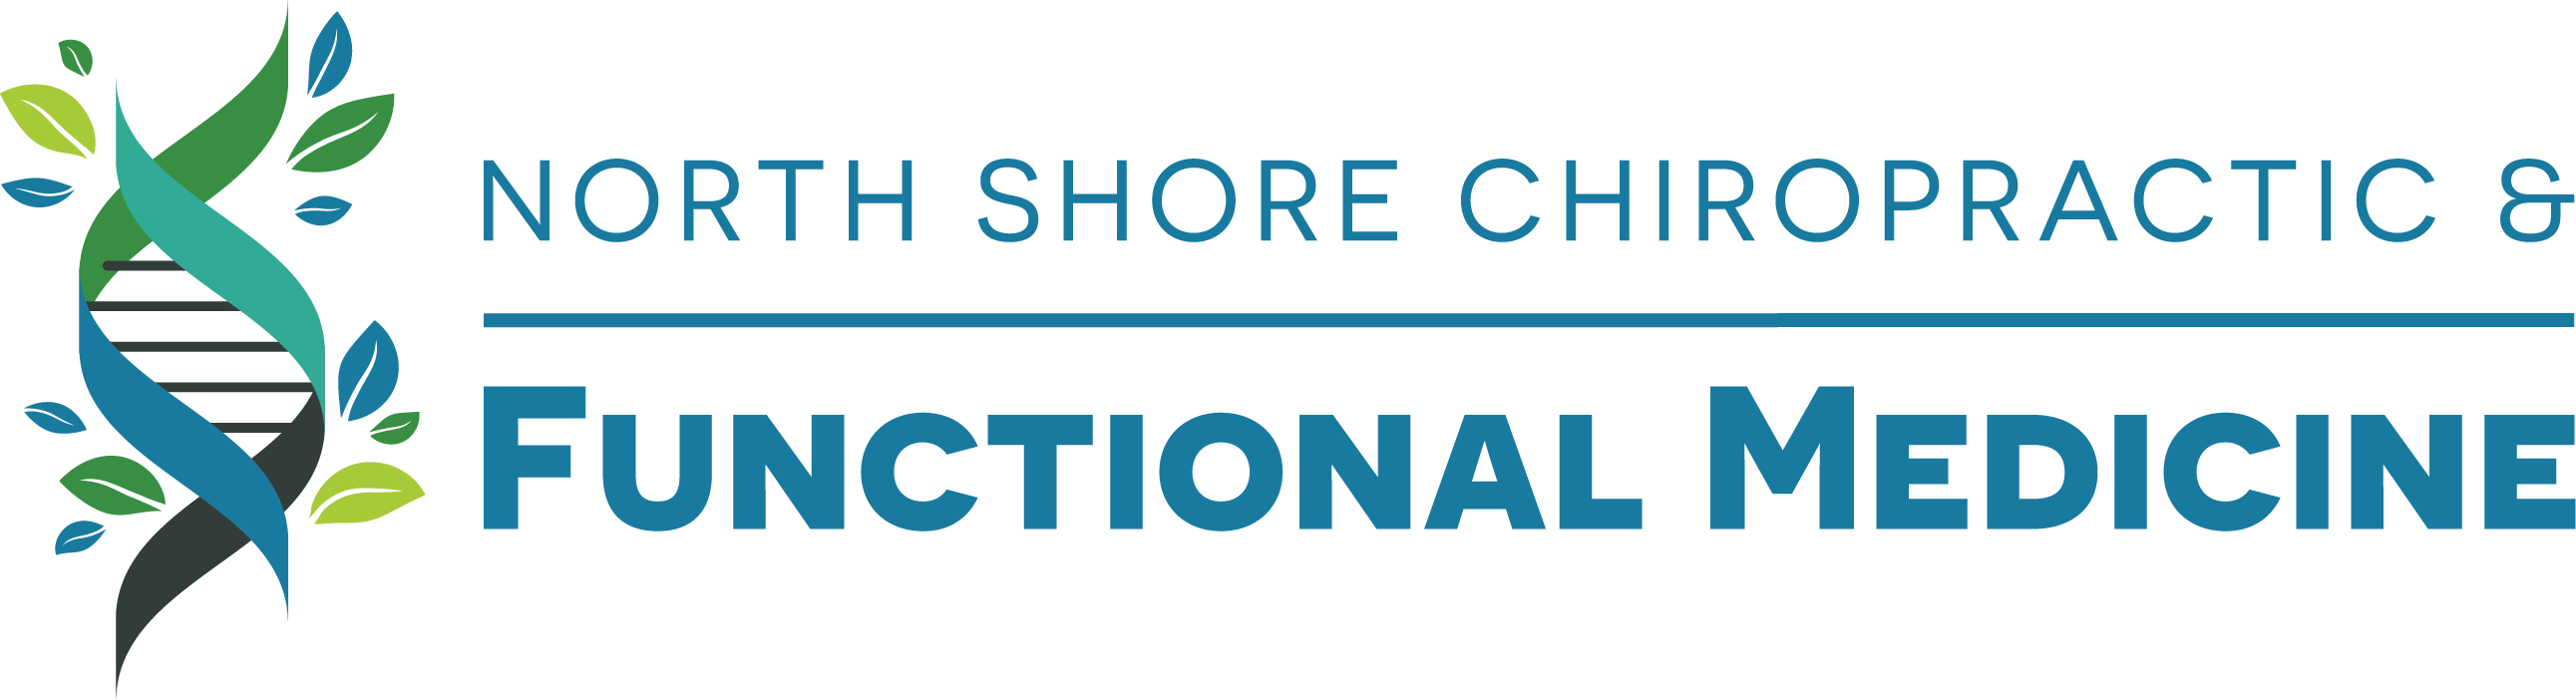 North Shore Functional Medicine & Chiropractic